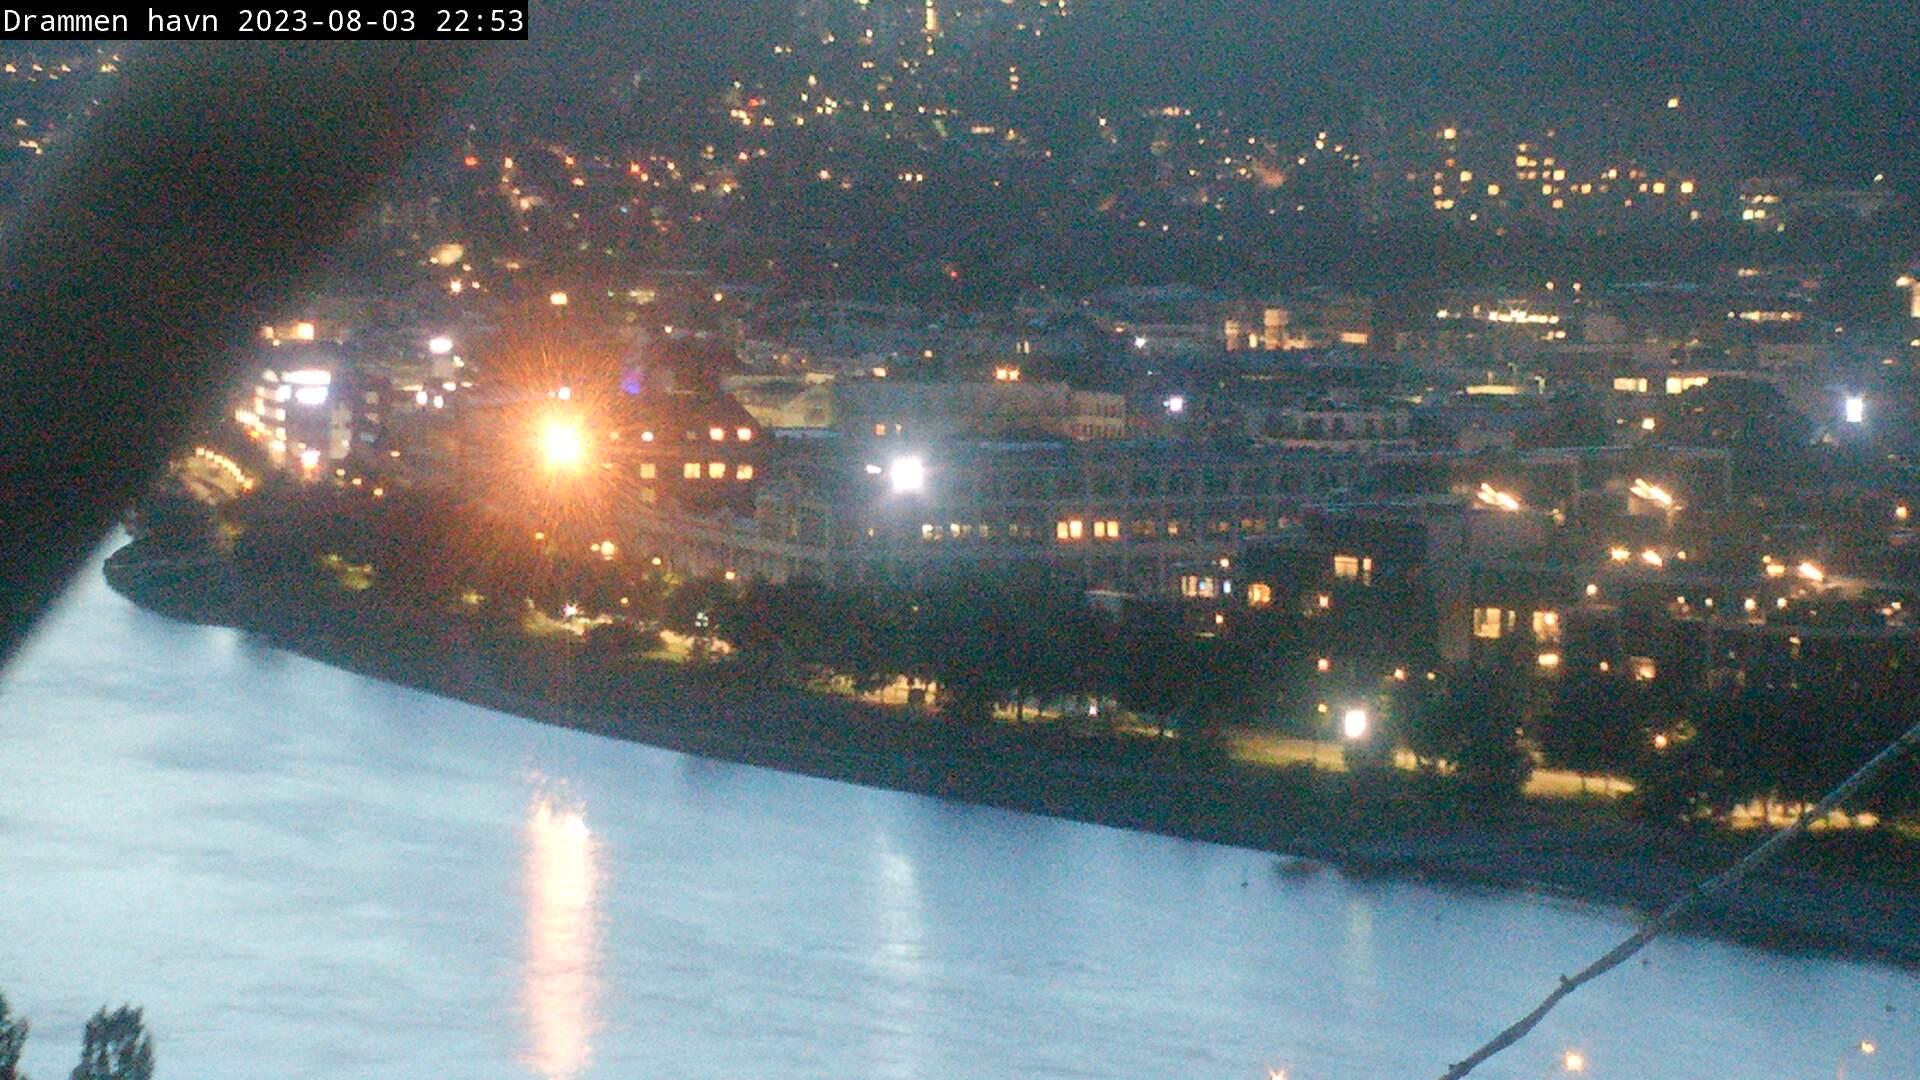 Webcam Drammen, Drammen, Buskerud, Norwegen